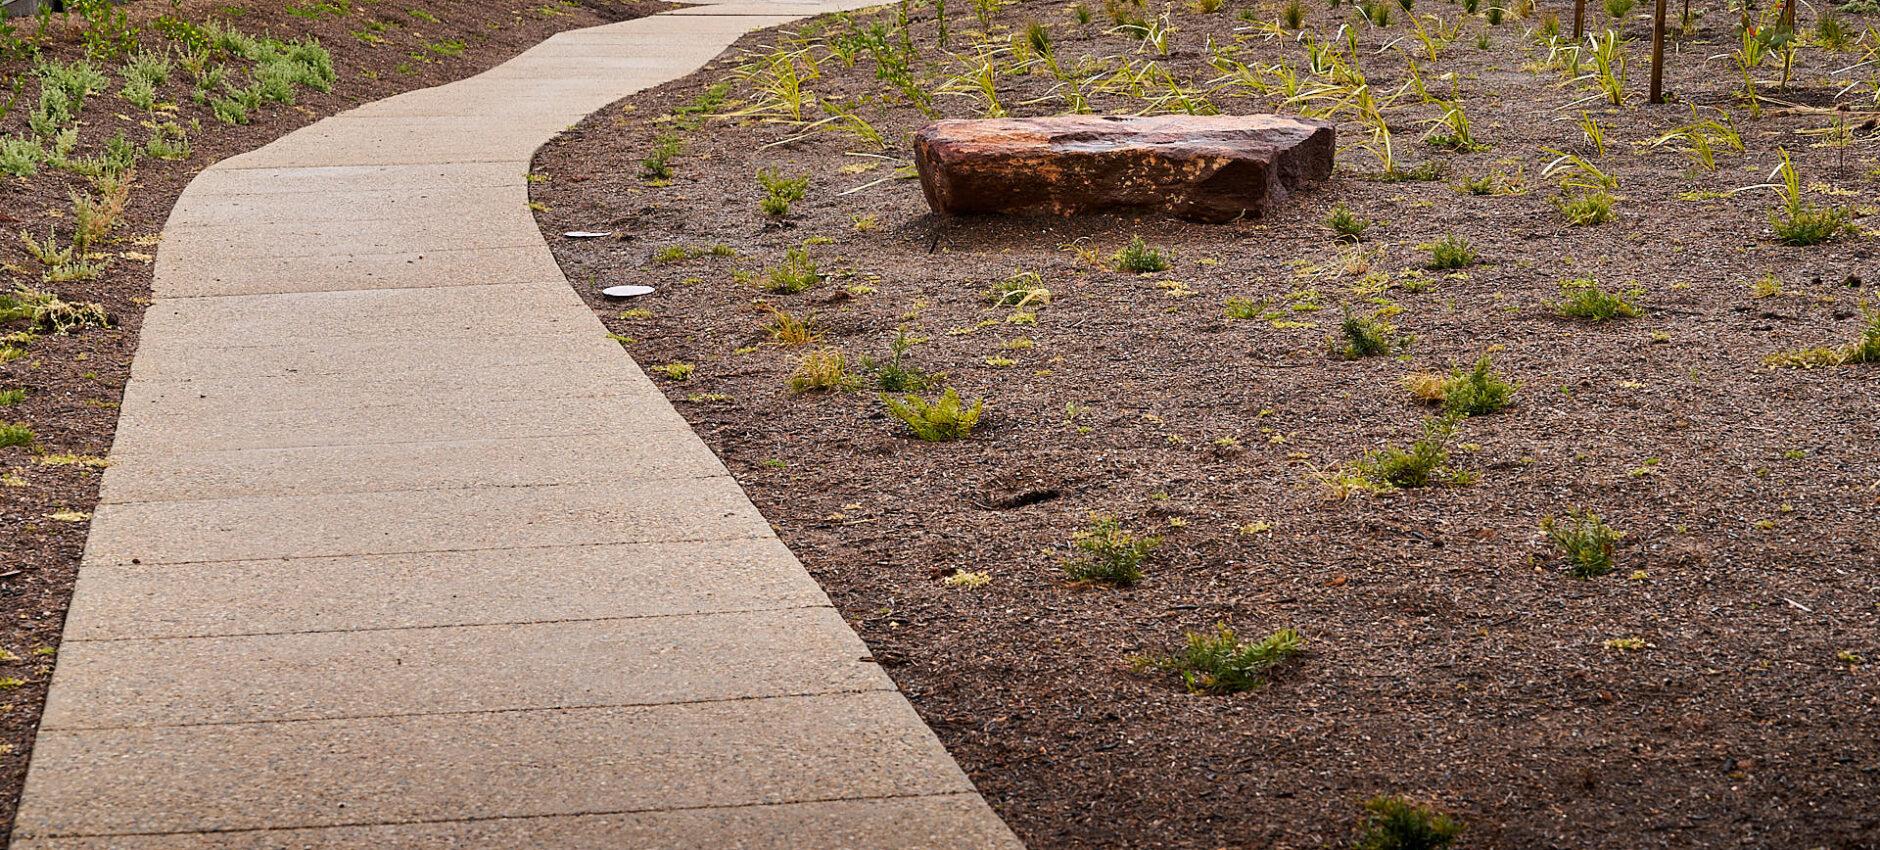 Space-Landscape_Springwood-Estate-Linear-Path_Jul2020_0040_LoRes.jpg